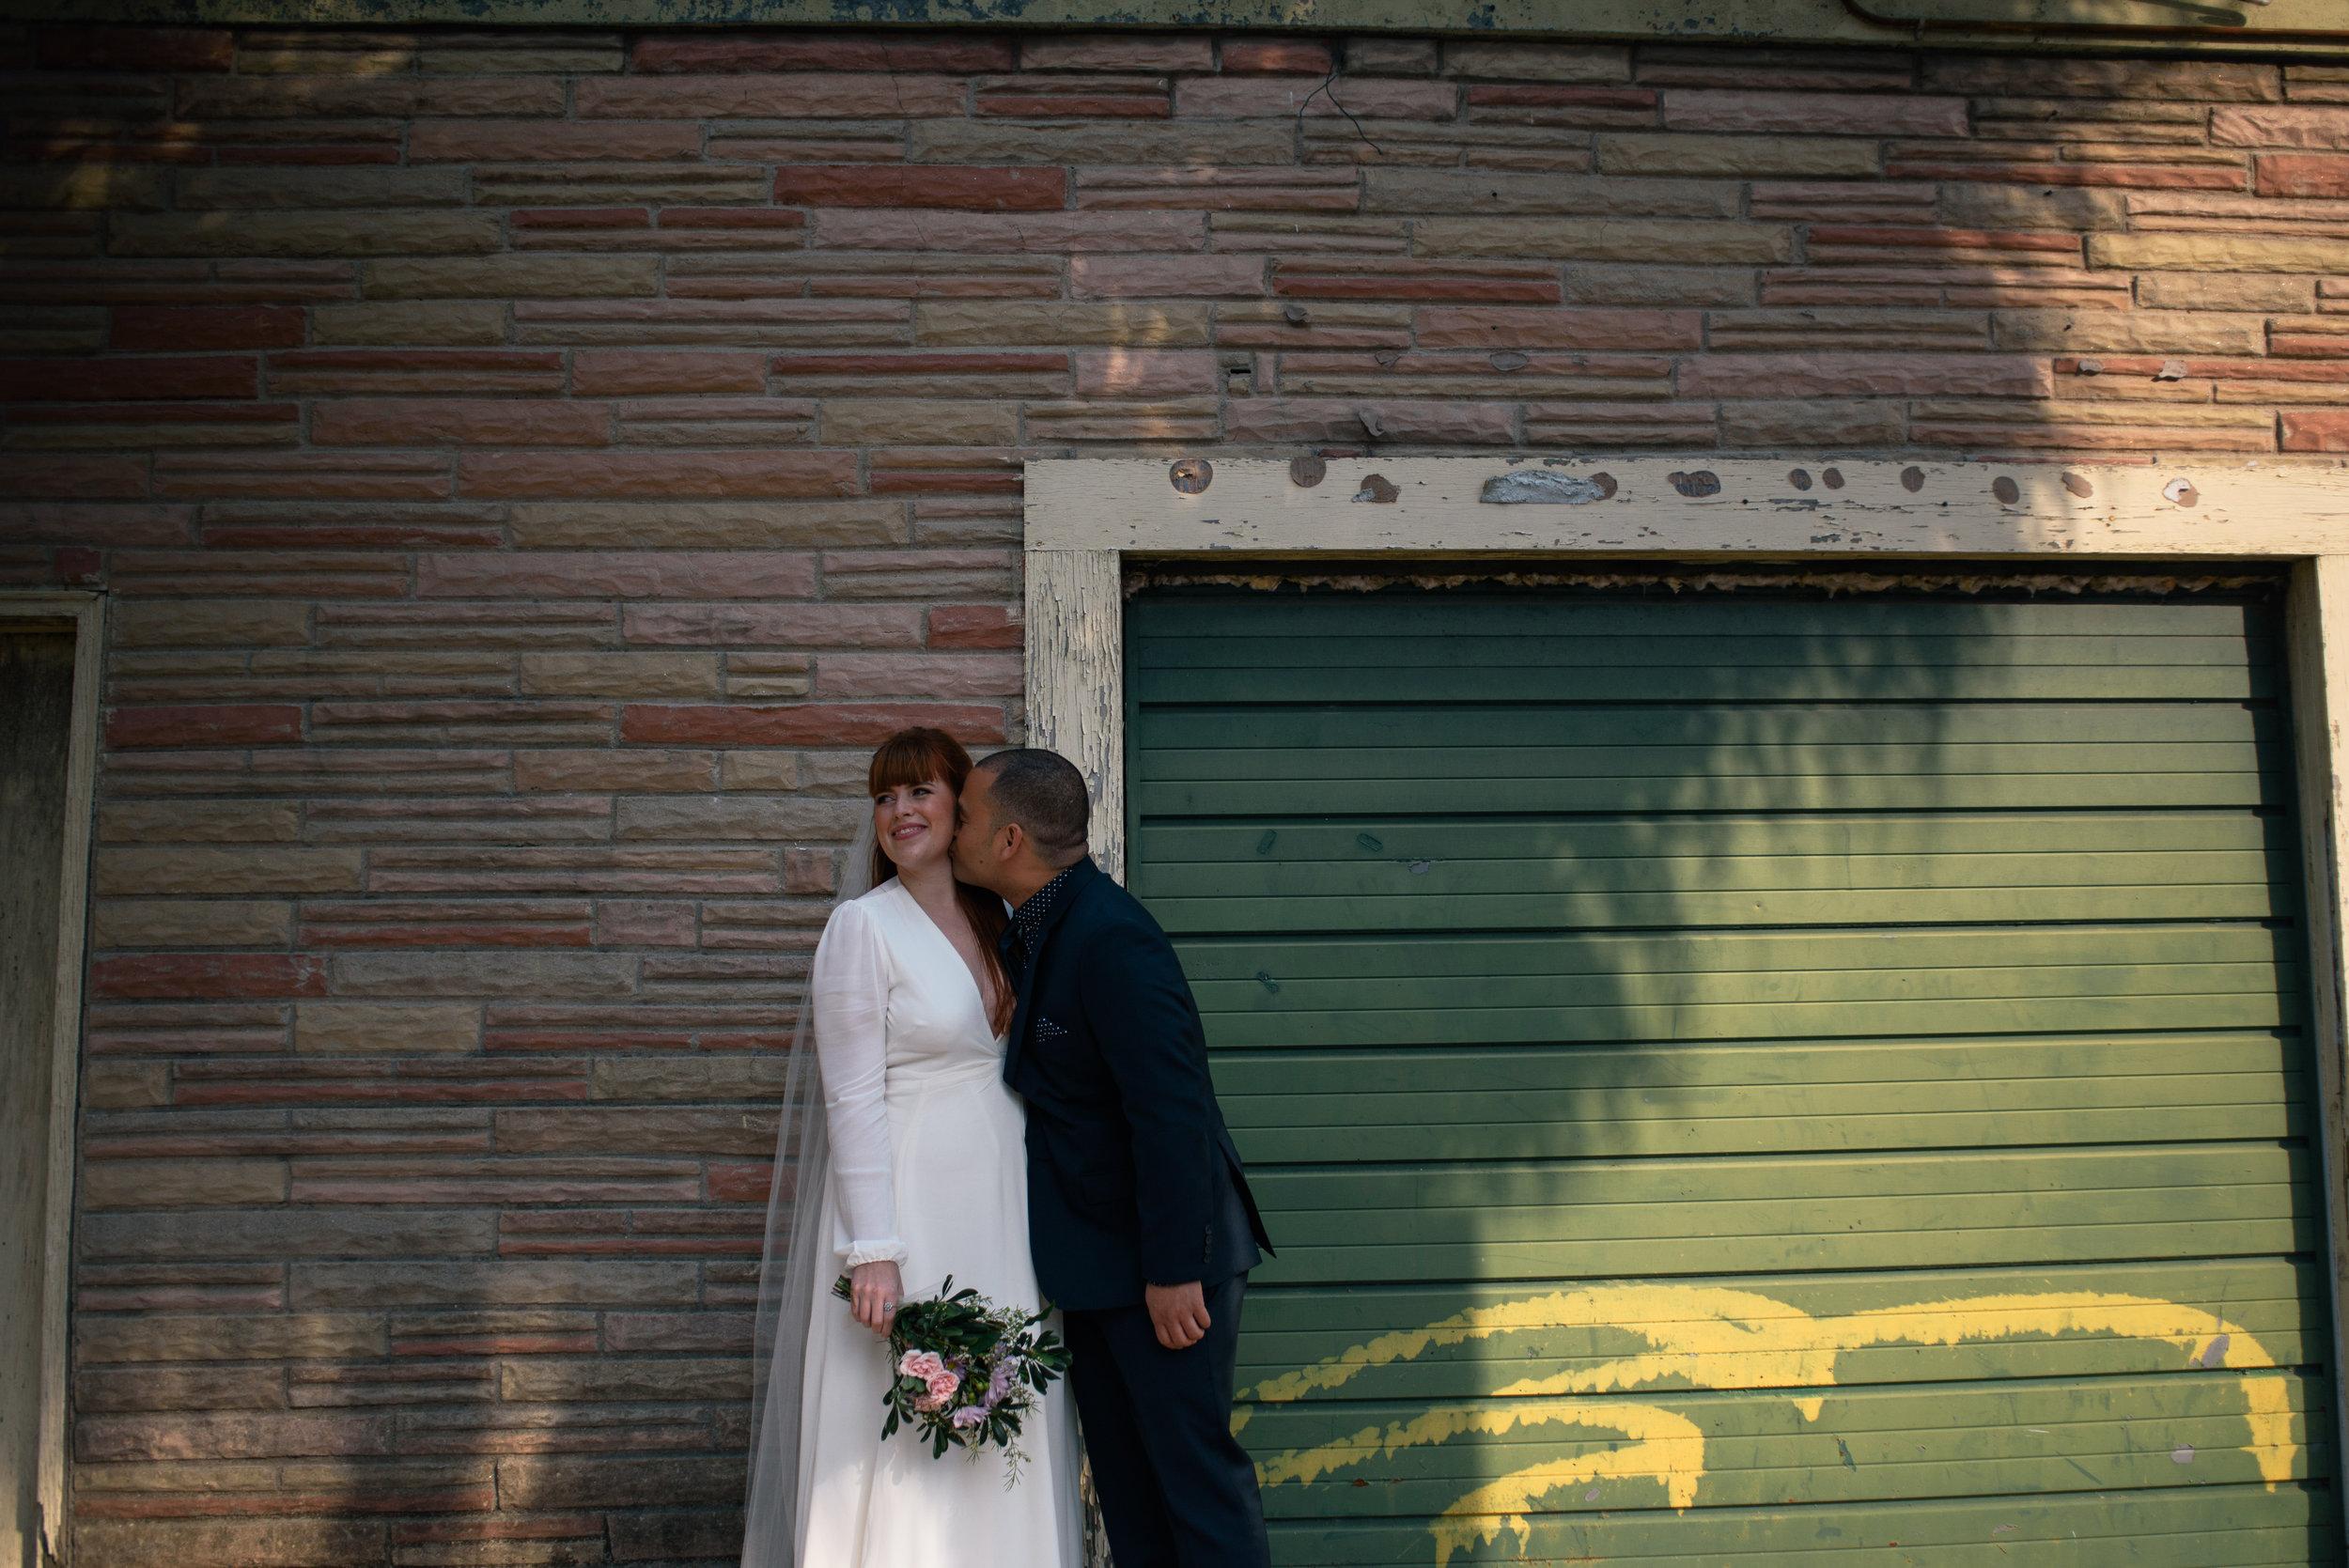 savannah-elopement-photography-savannah-georgia-elopement-photographer-savannah-wedding-photographer-meg-hill-photo-jade-hill- (33 of 58).jpg